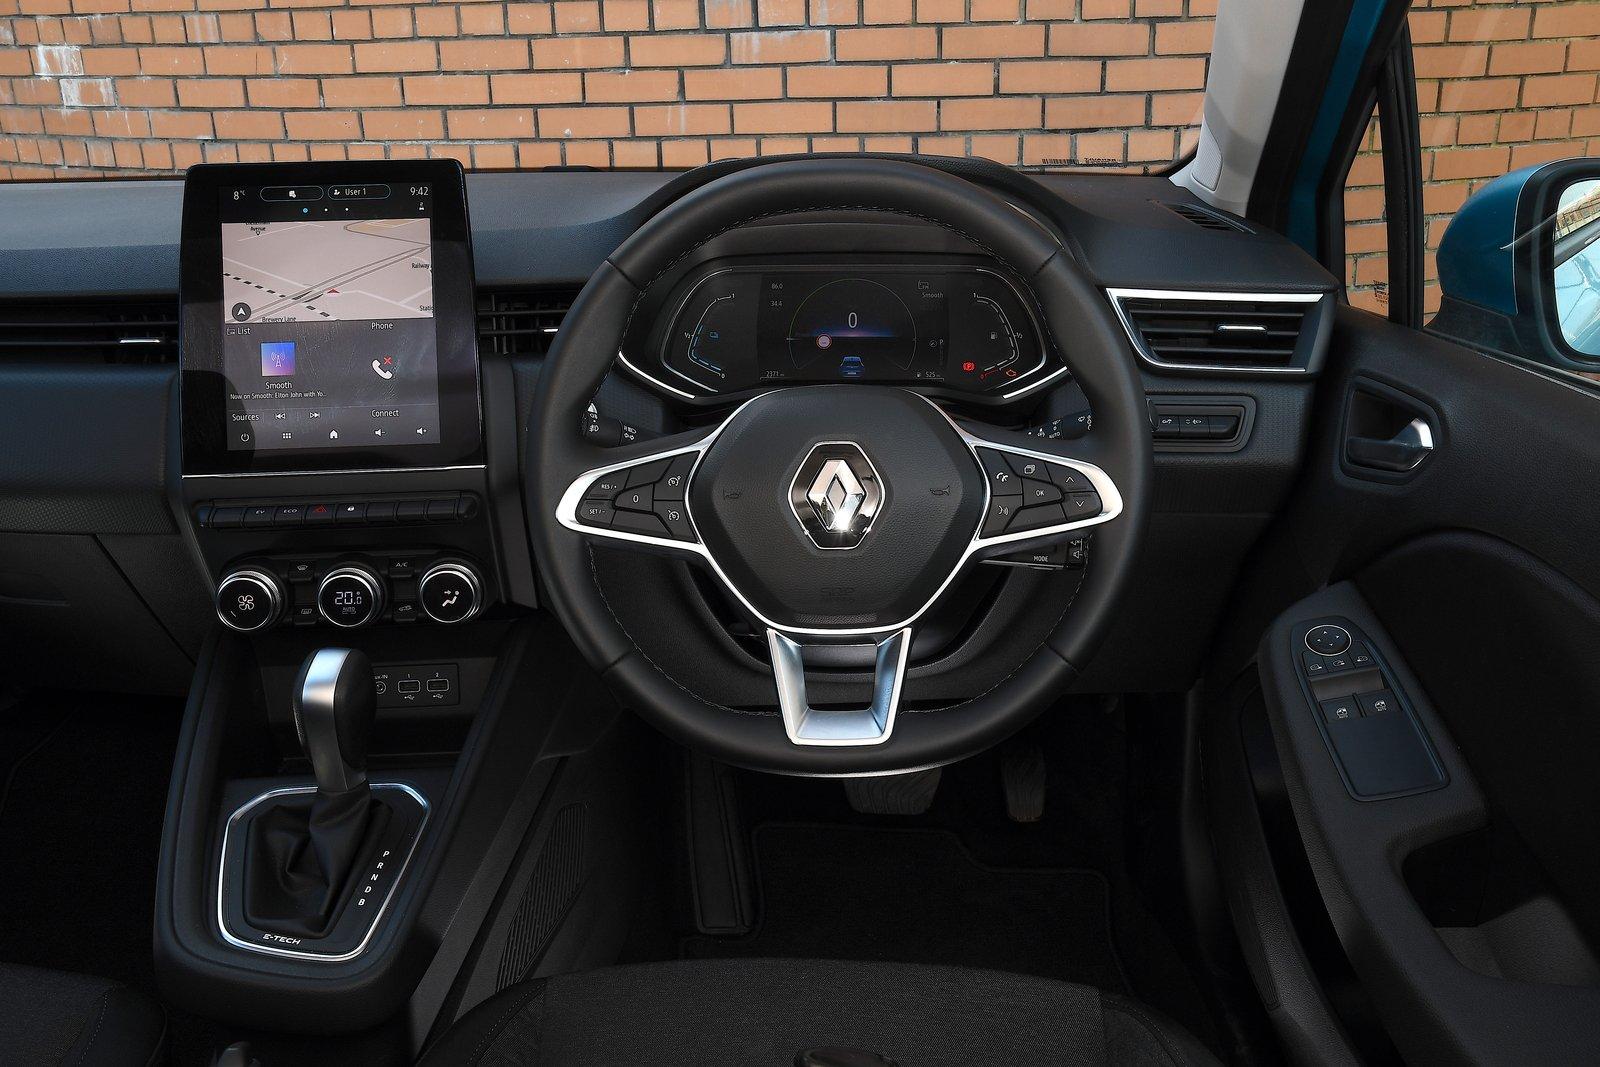 Renault Clio 2021 interior dashboard